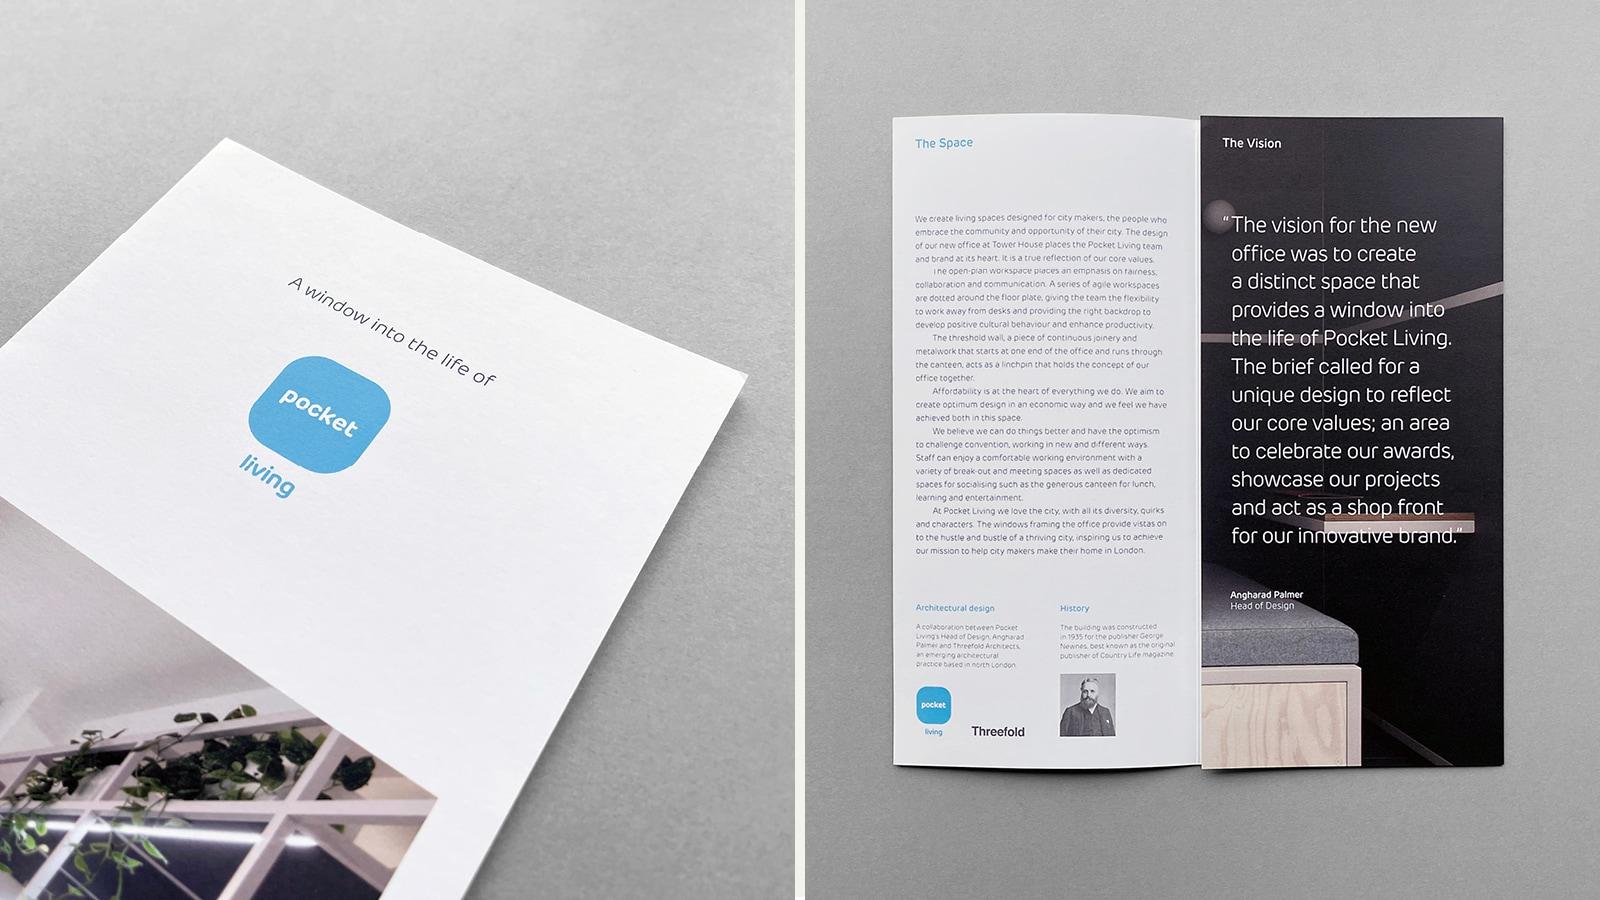 property-marketing-business-communications-branding-graphic-design-milton-keynes-london15